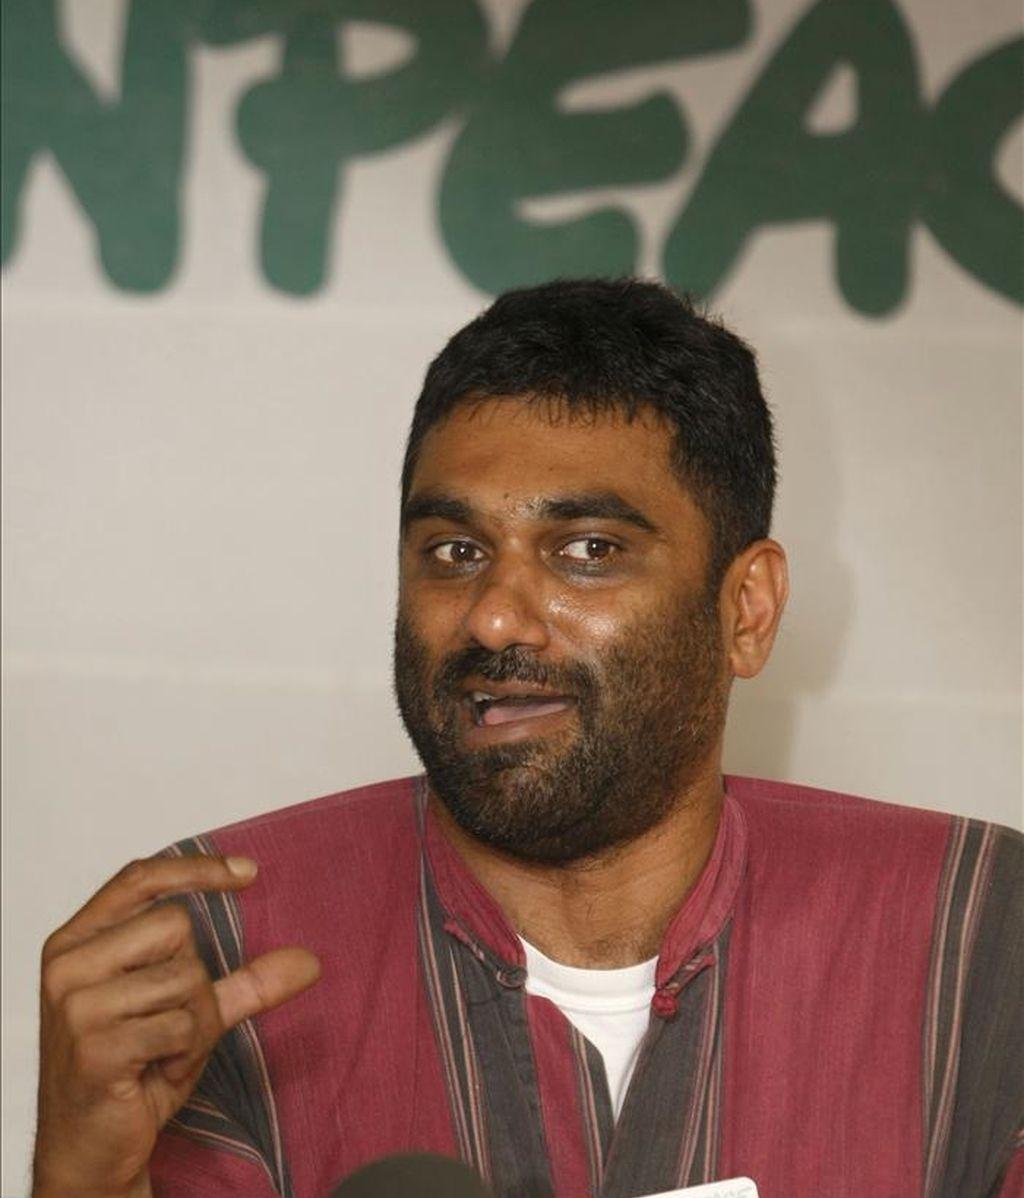 El director de Greenpeace Internacional, Kumi Naidoo. EFE/Archivo